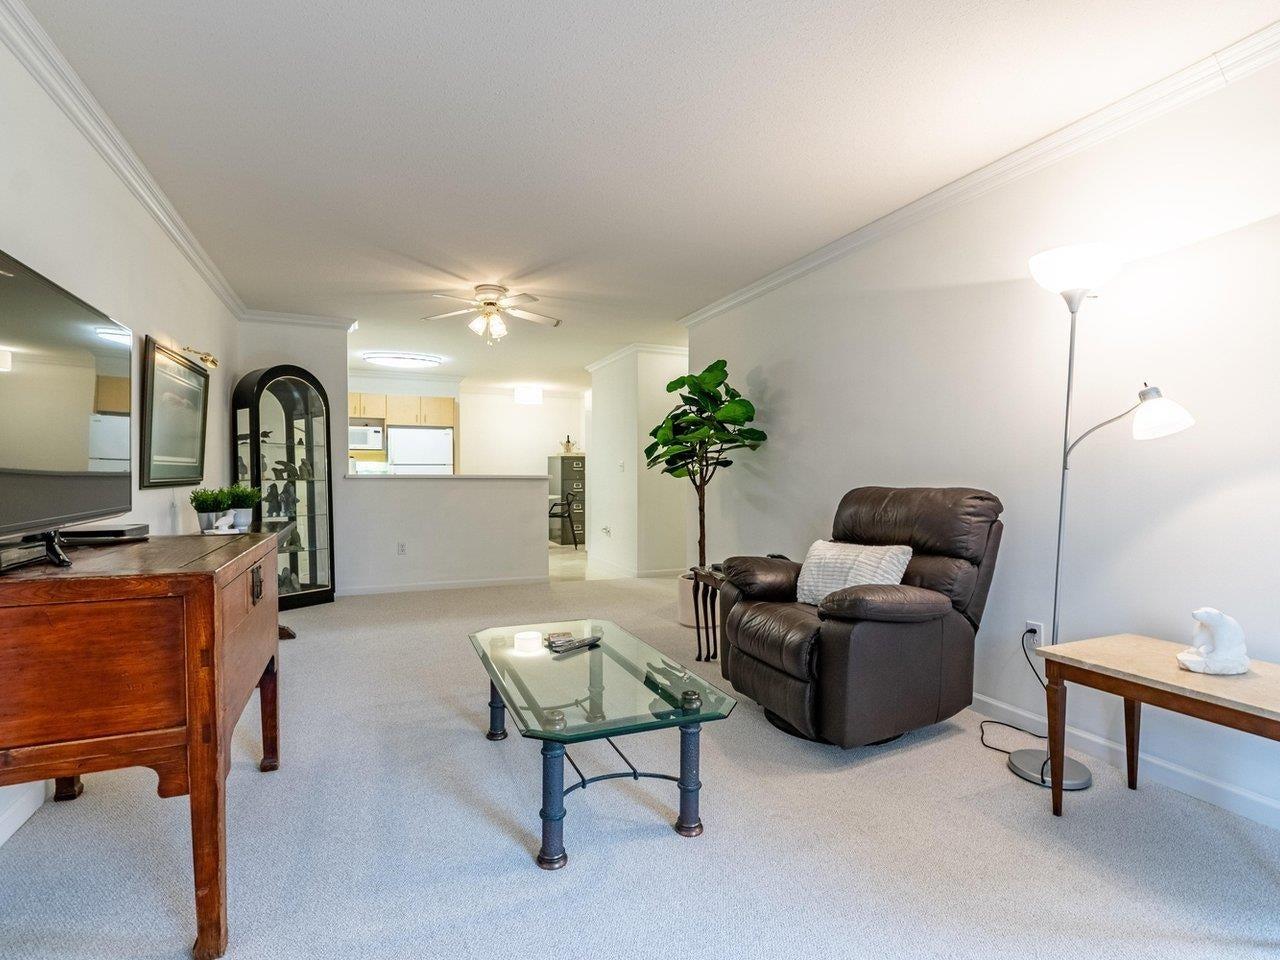 306 15298 20 AVENUE - King George Corridor Apartment/Condo for sale, 2 Bedrooms (R2625551) - #14